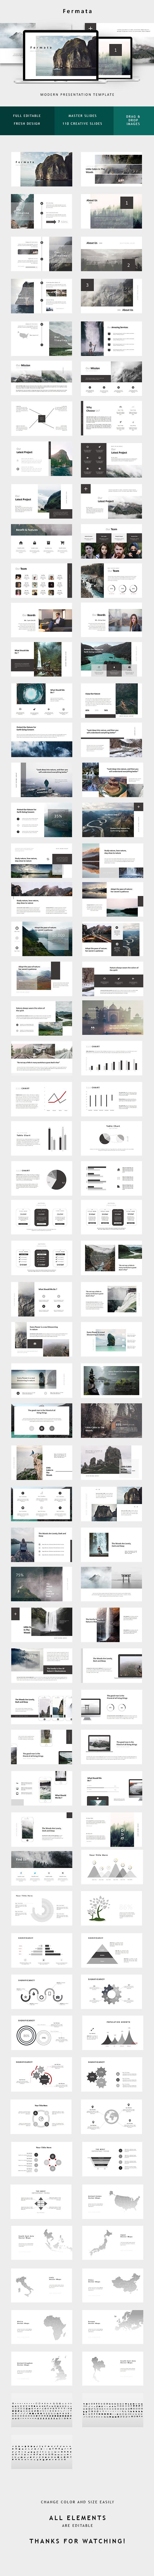 Creative Minimal Powerpoint - PowerPoint Templates Presentation Templates